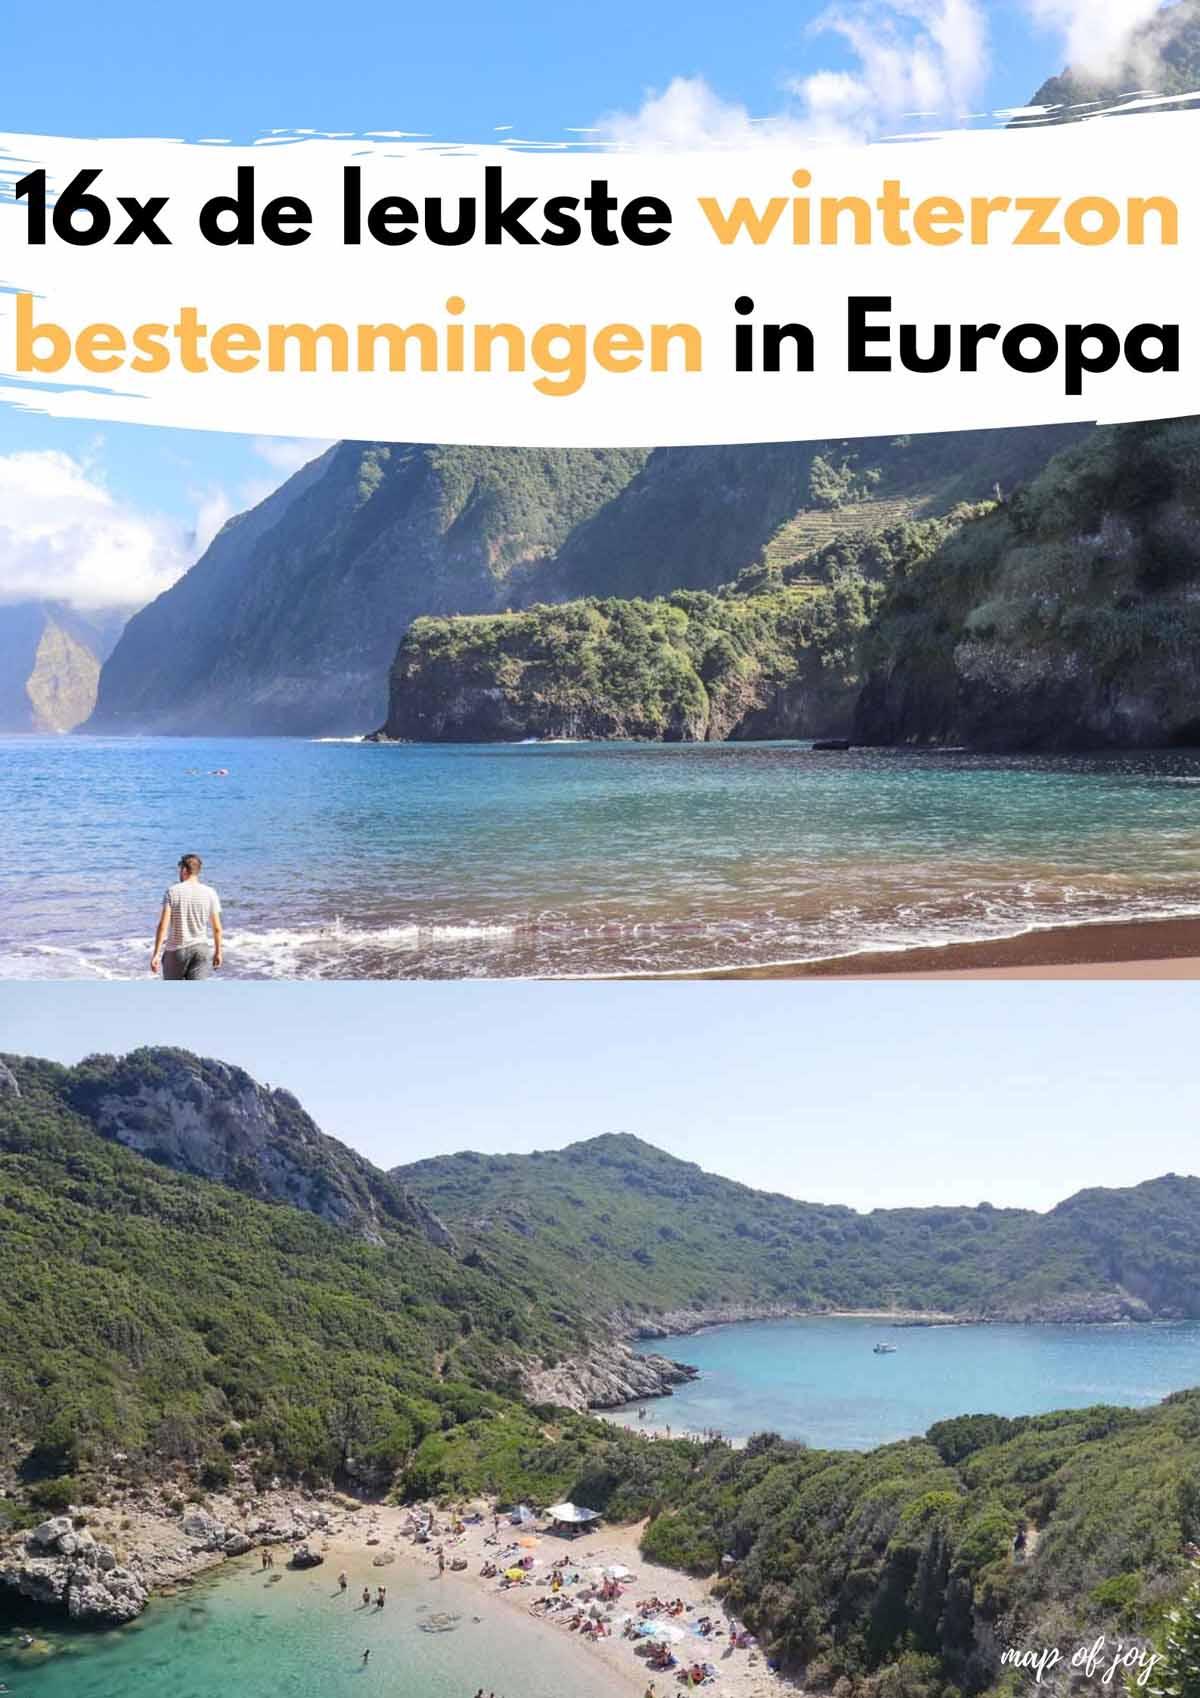 16x de leukste winterzon bestemmingen in Europa - Map of Joy